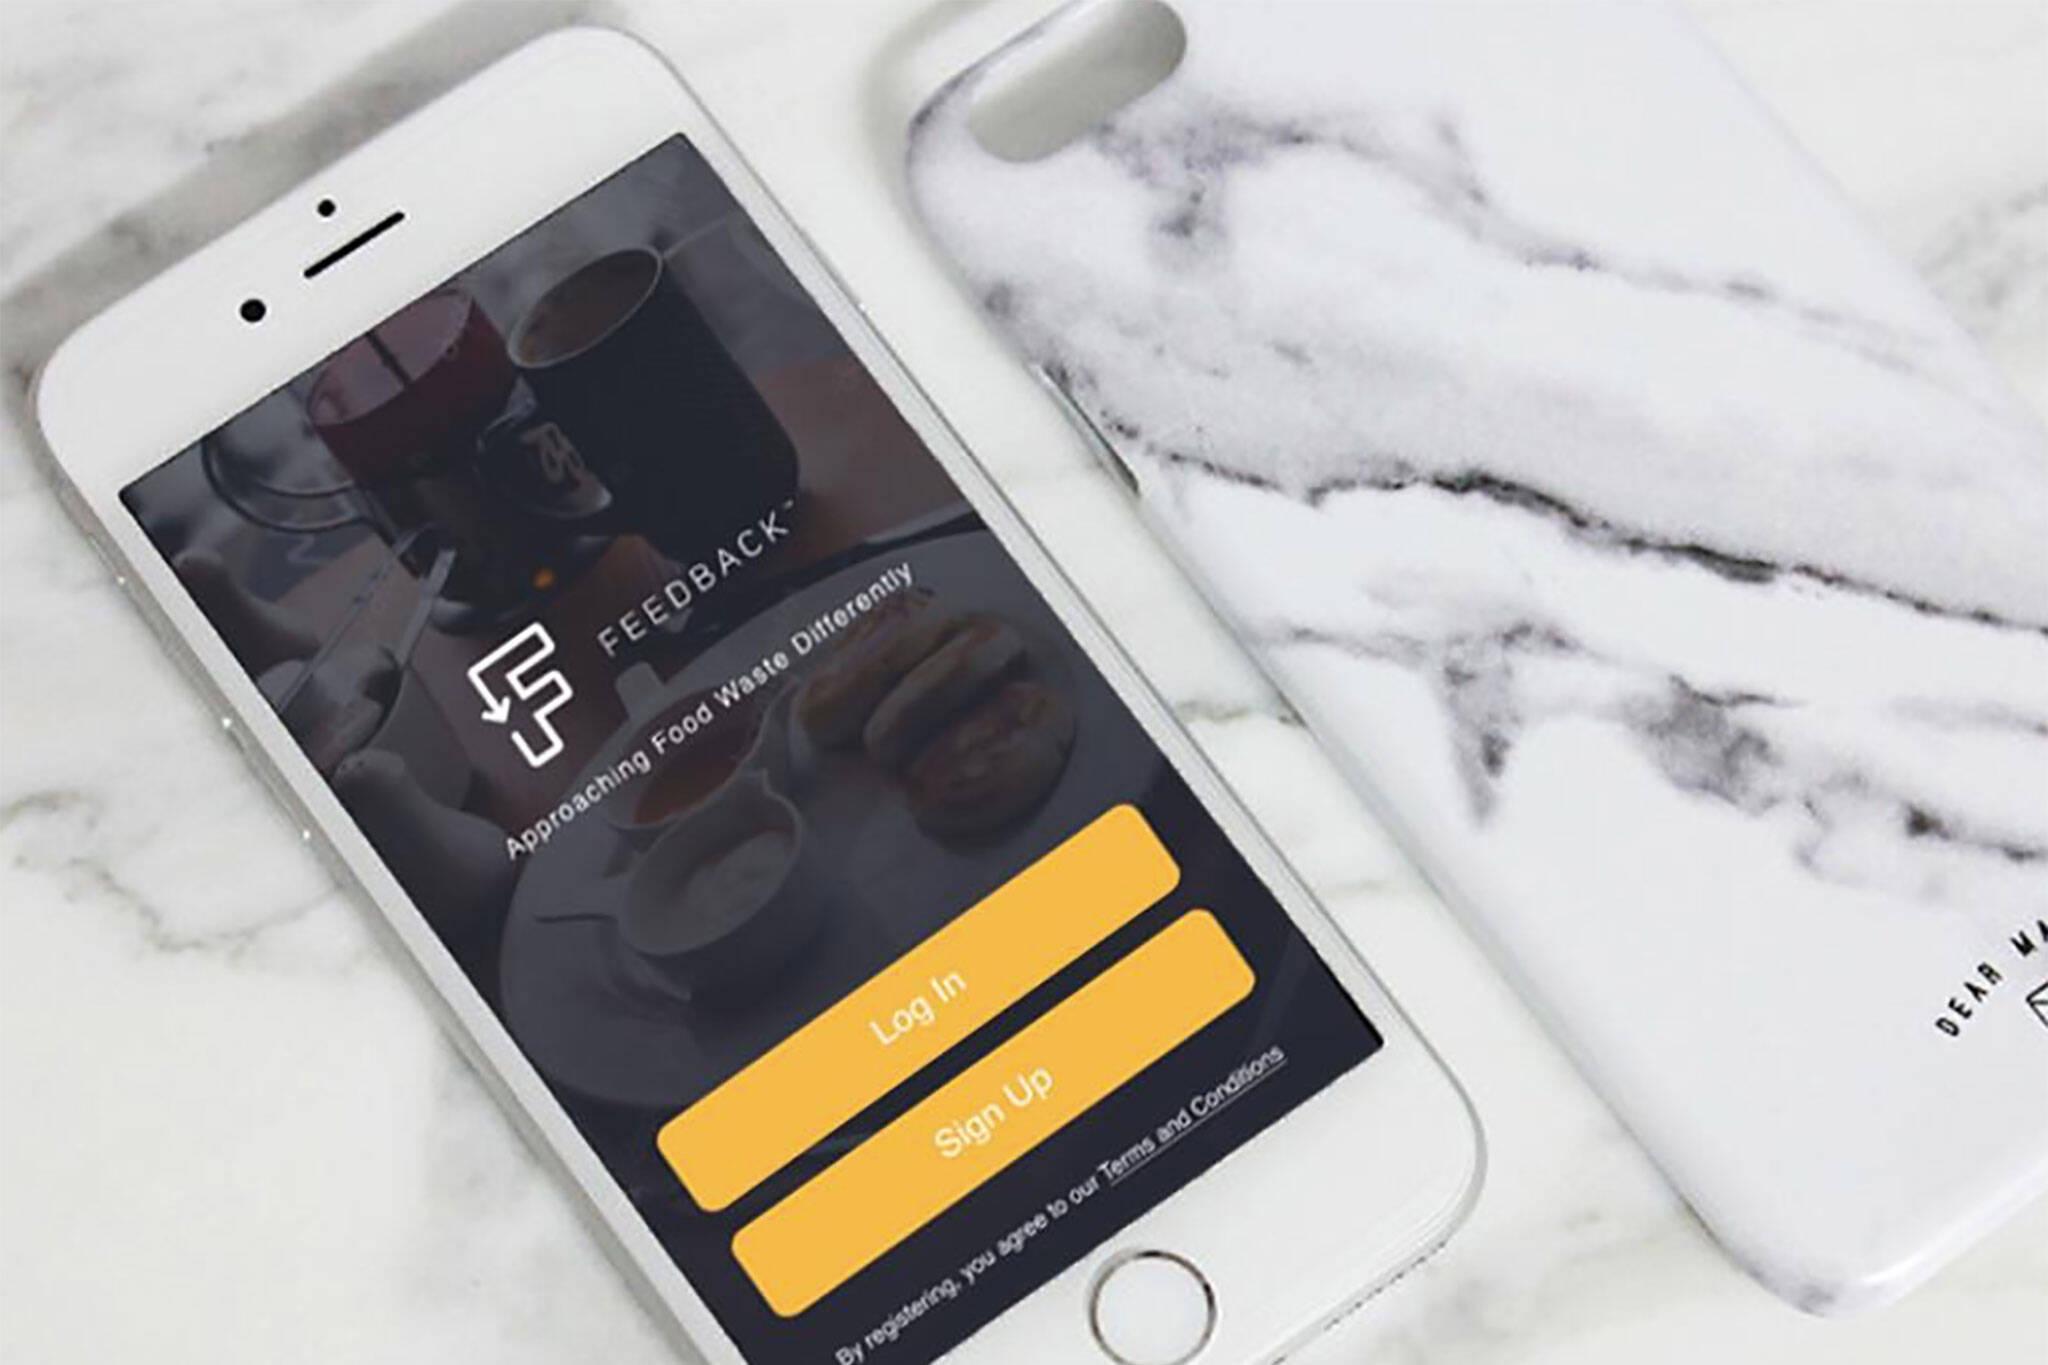 feedback app toronto